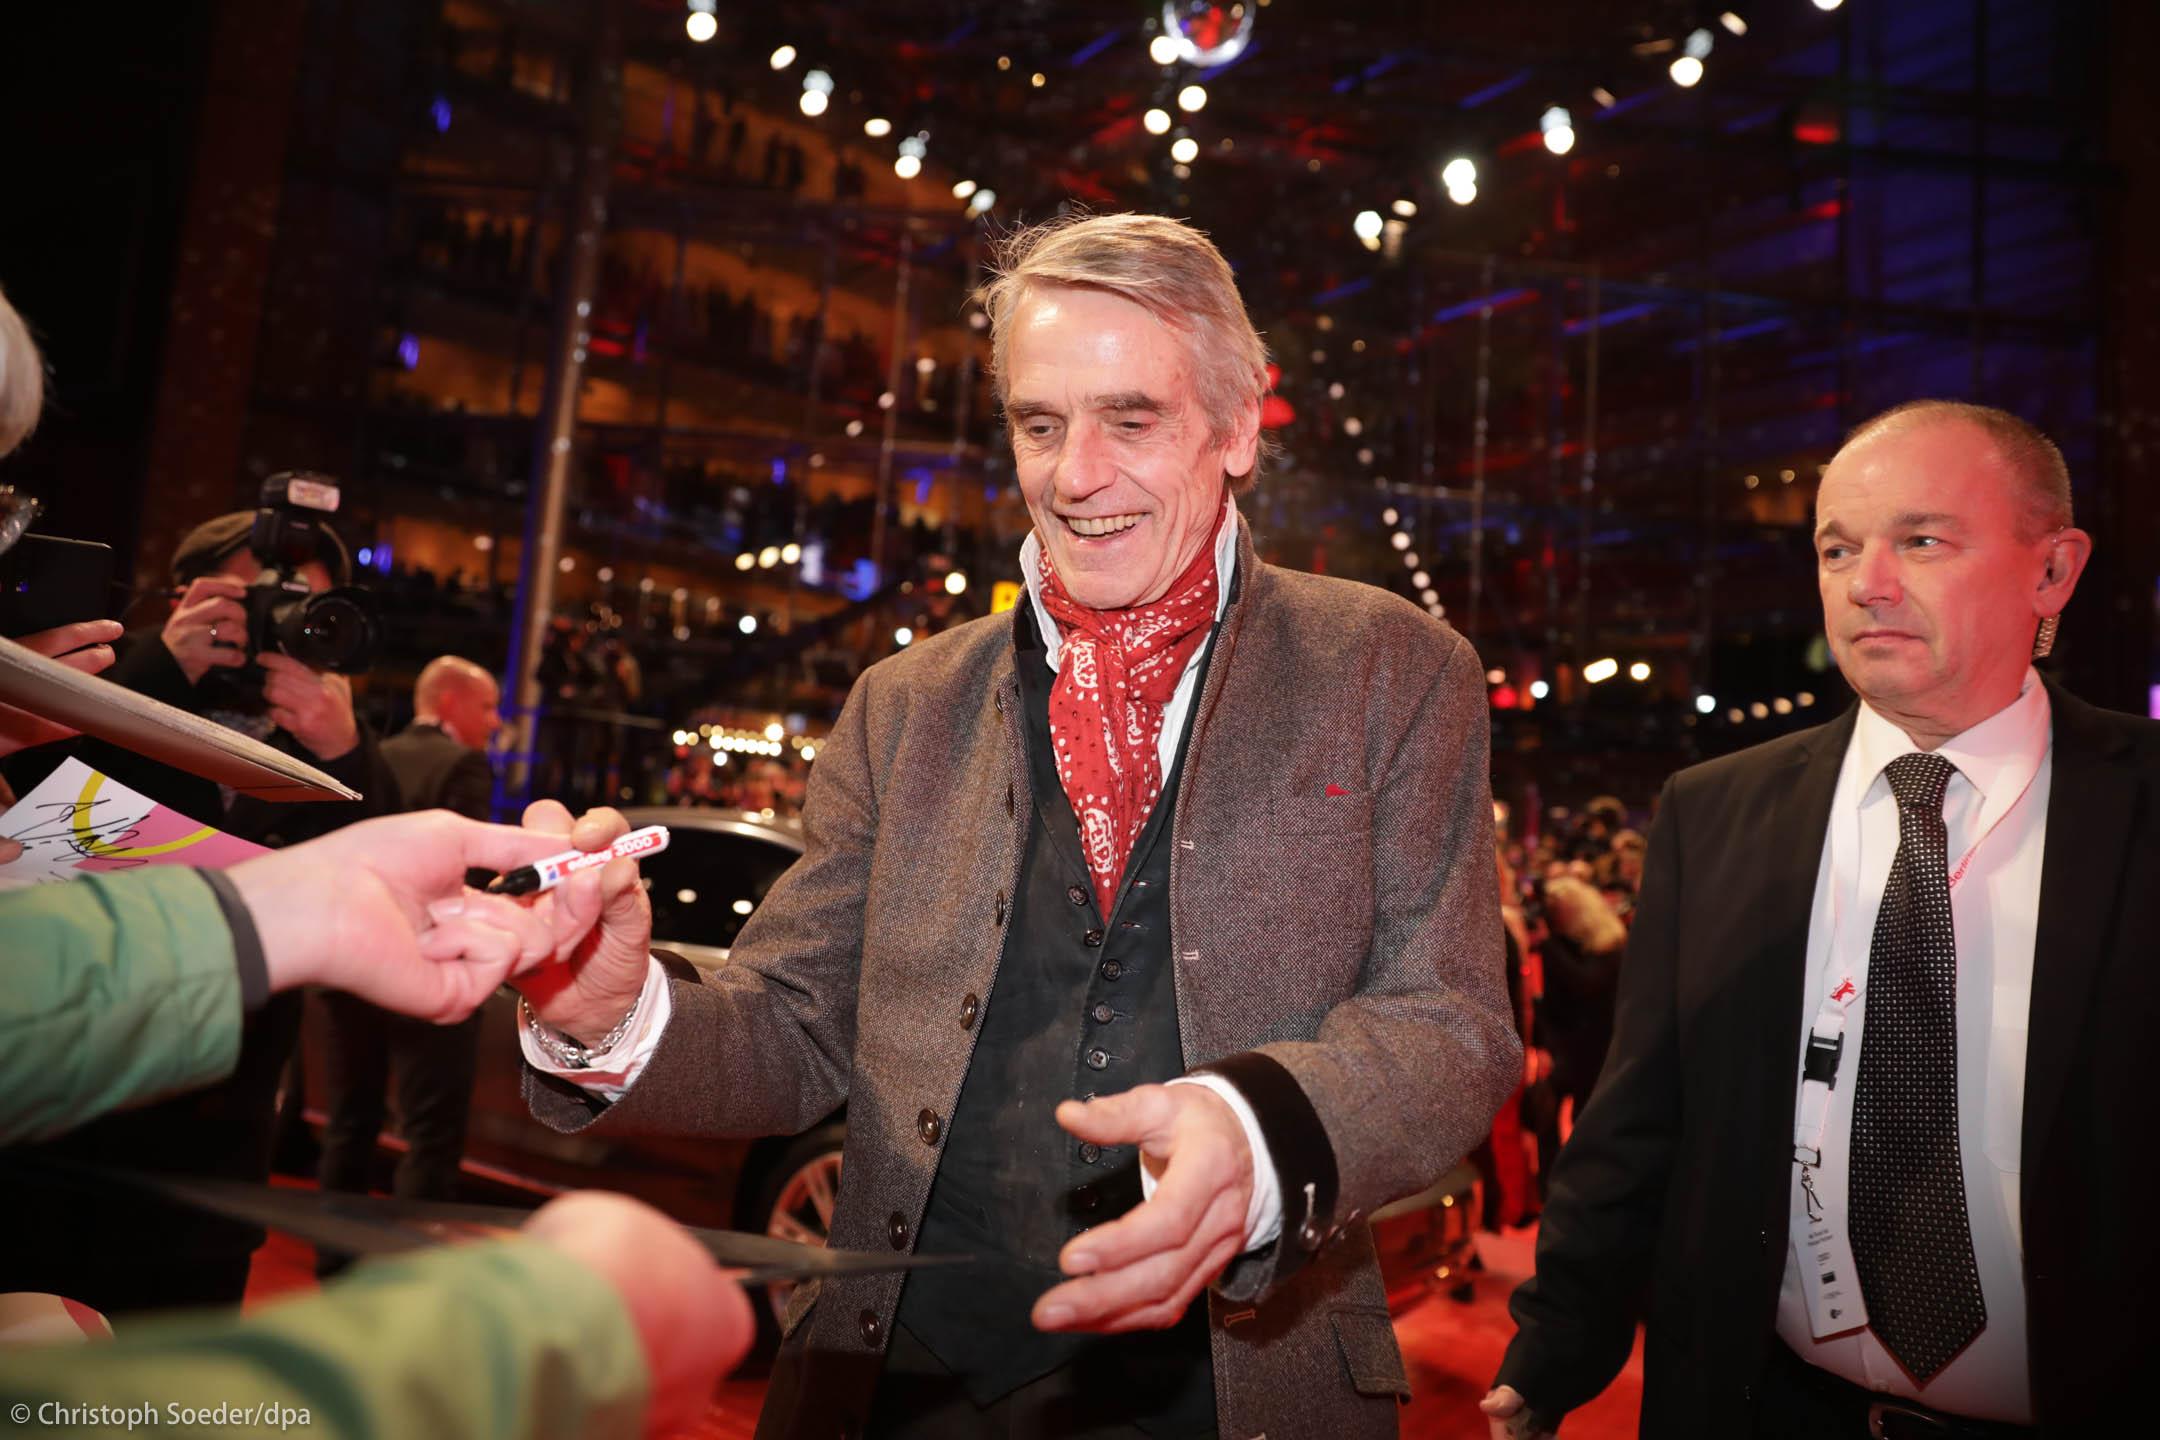 Berlinale Jury President Jeremy Irons